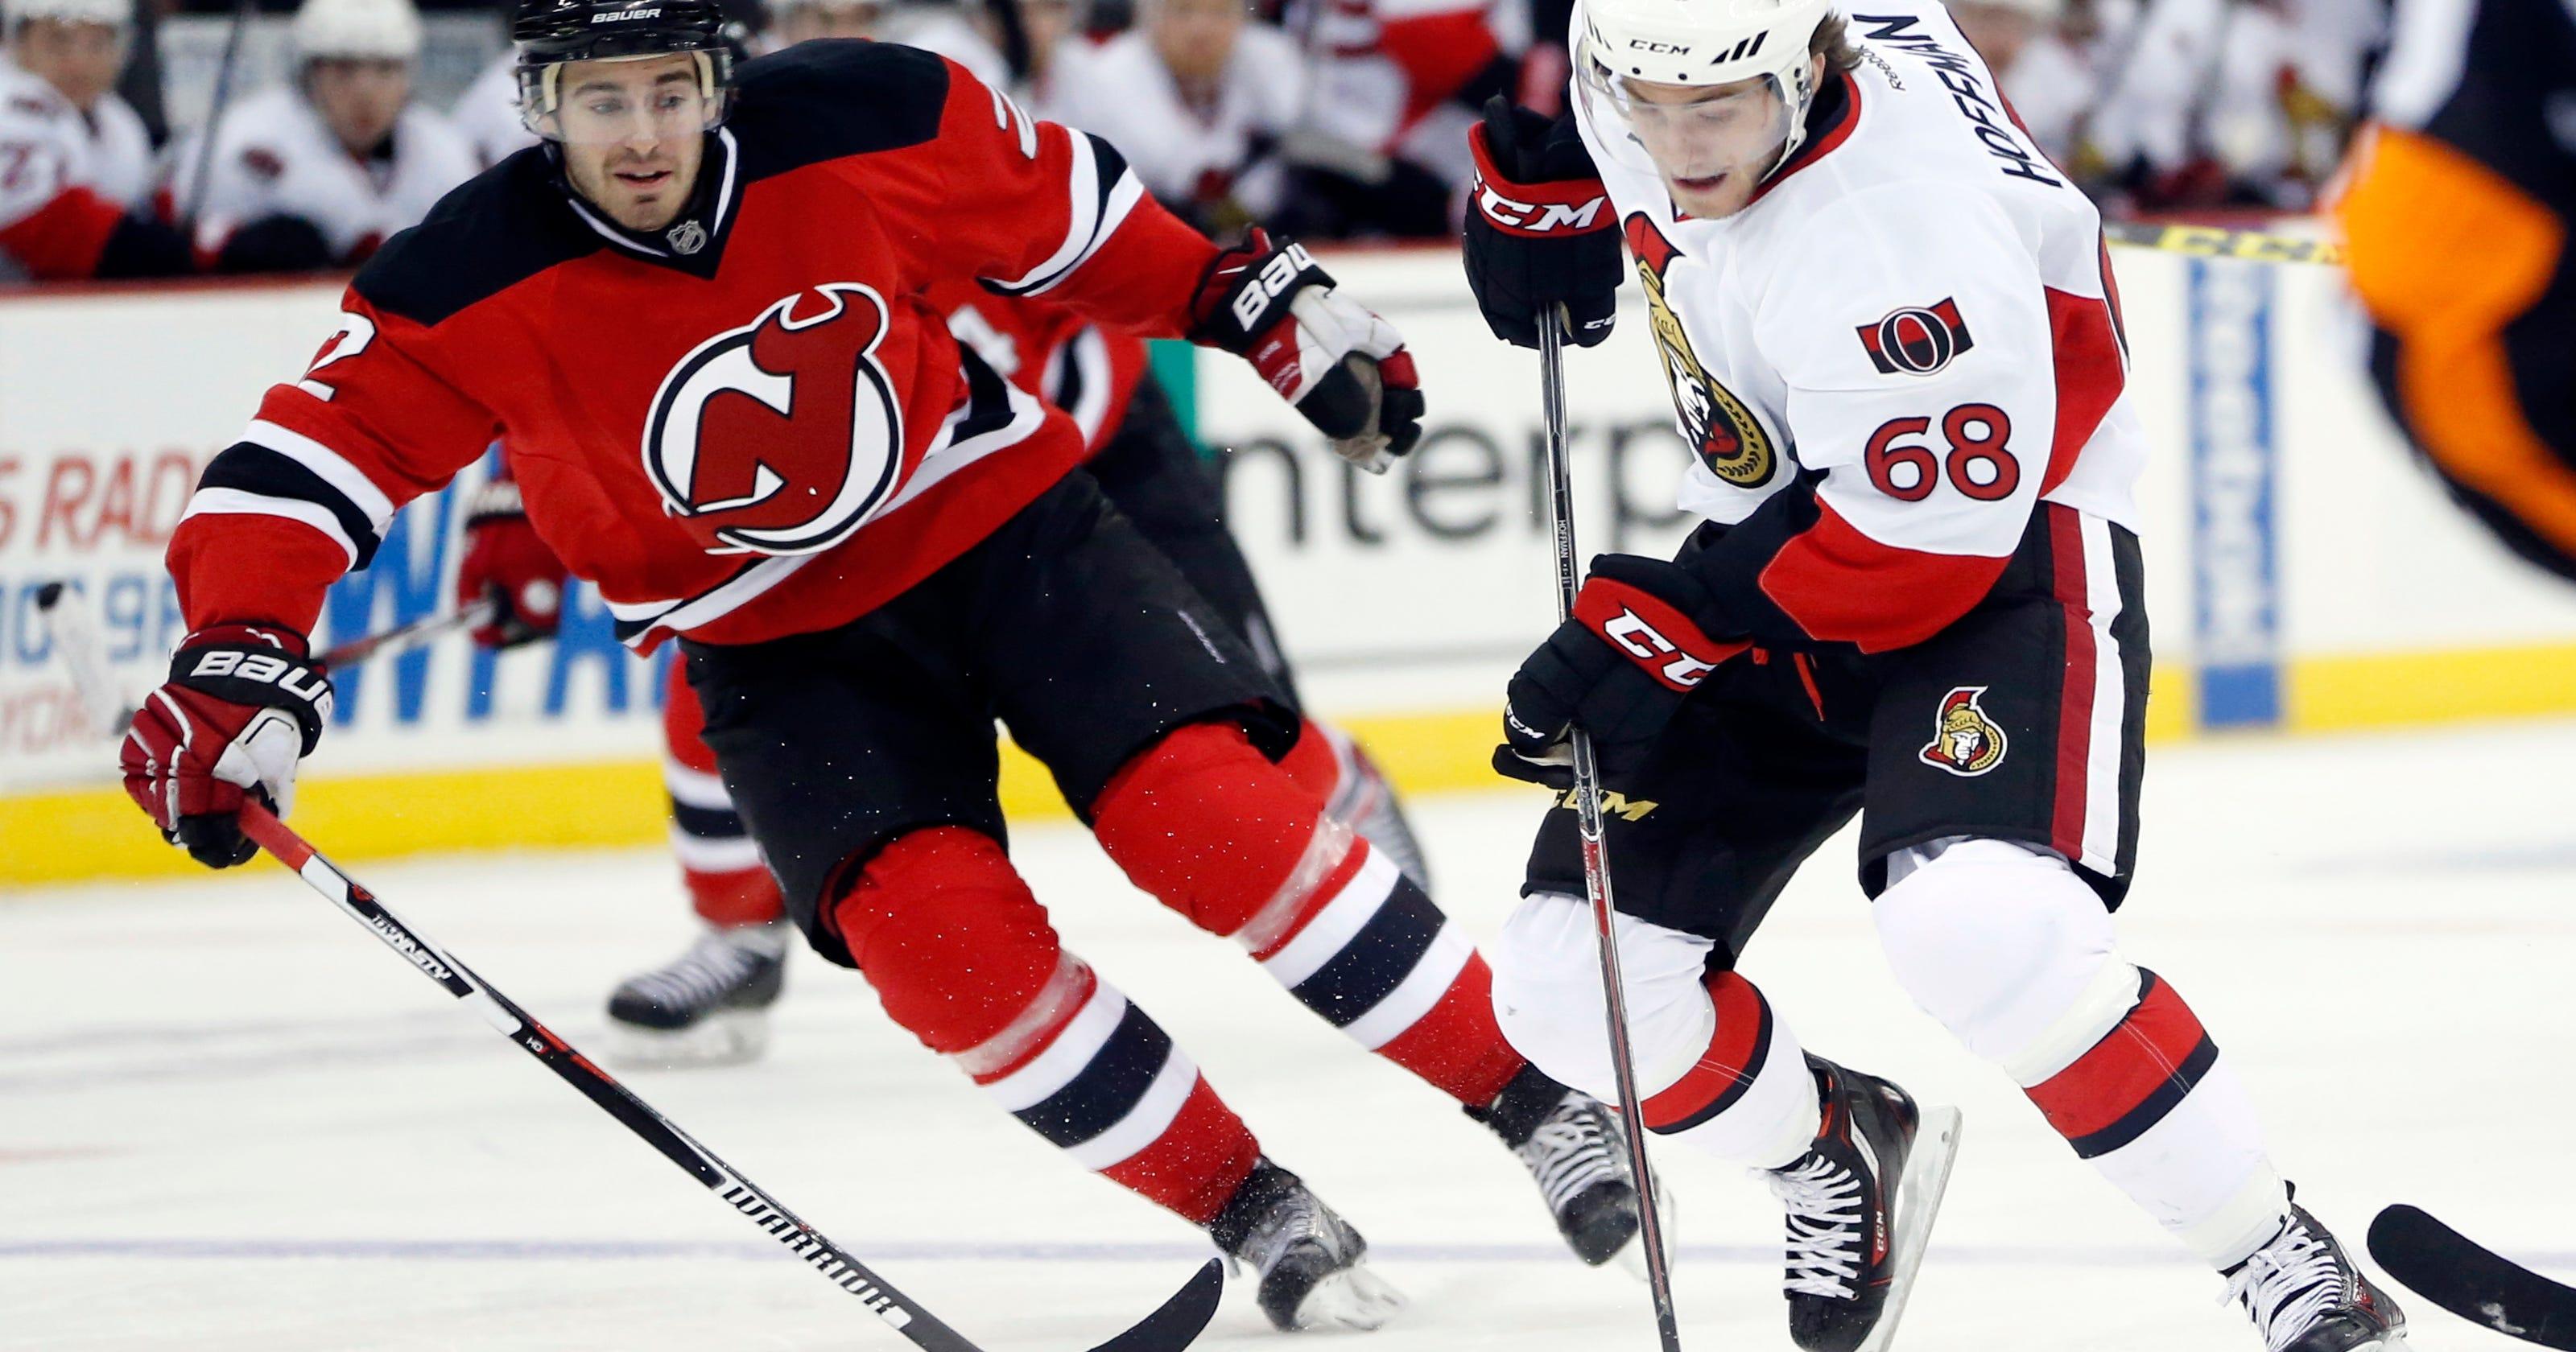 the latest c5dd0 c53b2 Zajac has goal, 3 assists as Devils beat Senators